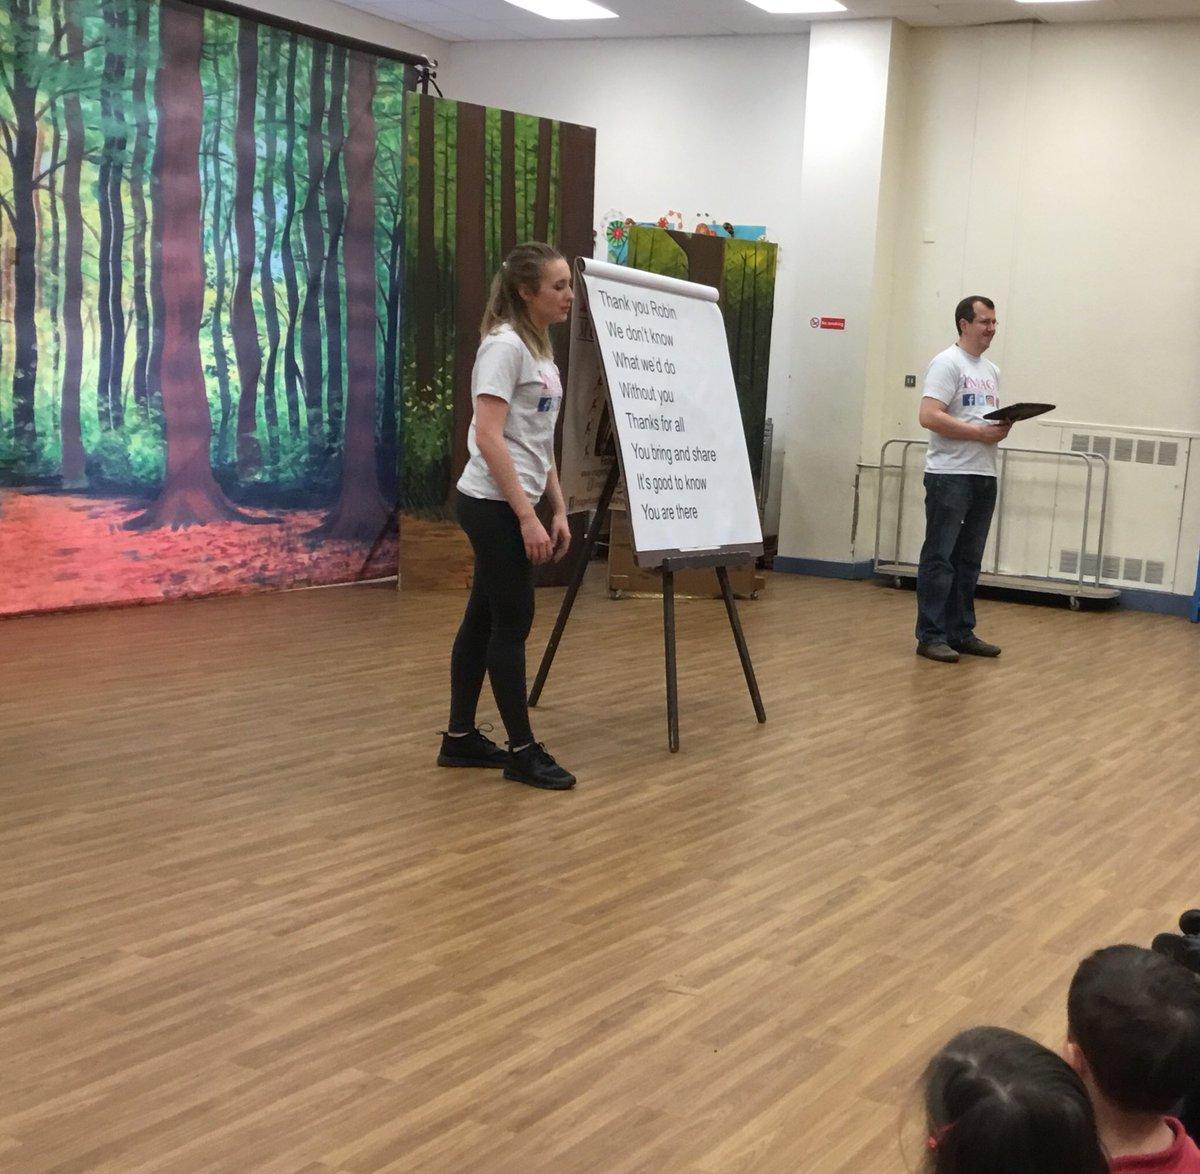 test Twitter Media - Learning songs from the show 'Robin Hood' so we can be the best chorus! #gorseypshe @GorseyBank @GorseyRec @GorseyY1 @ImageTheatreUK https://t.co/sKfrGvWmlM